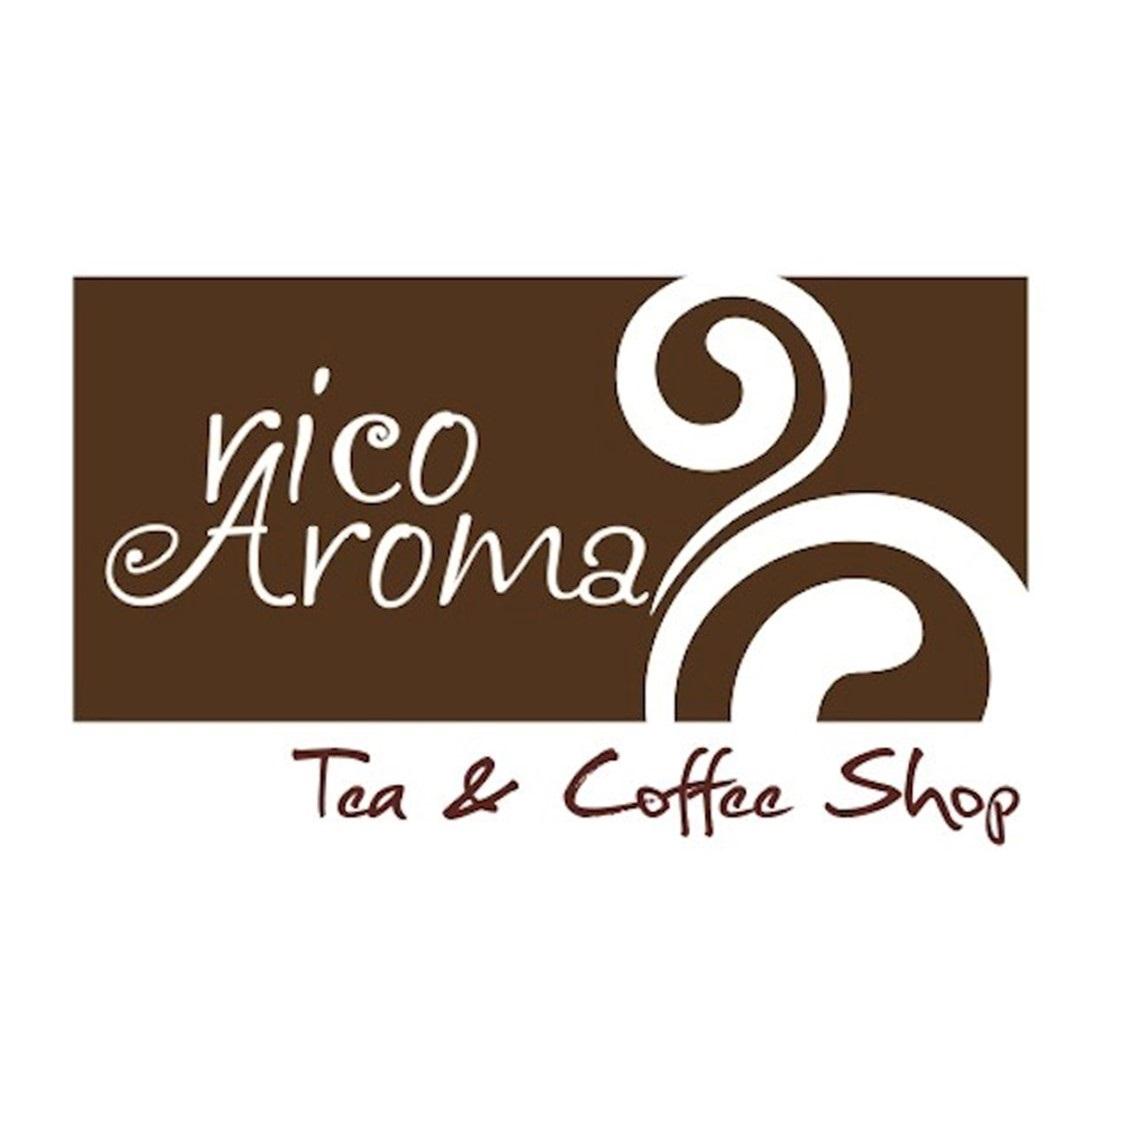 RICO AROMA TEA & COFFEE SHOP